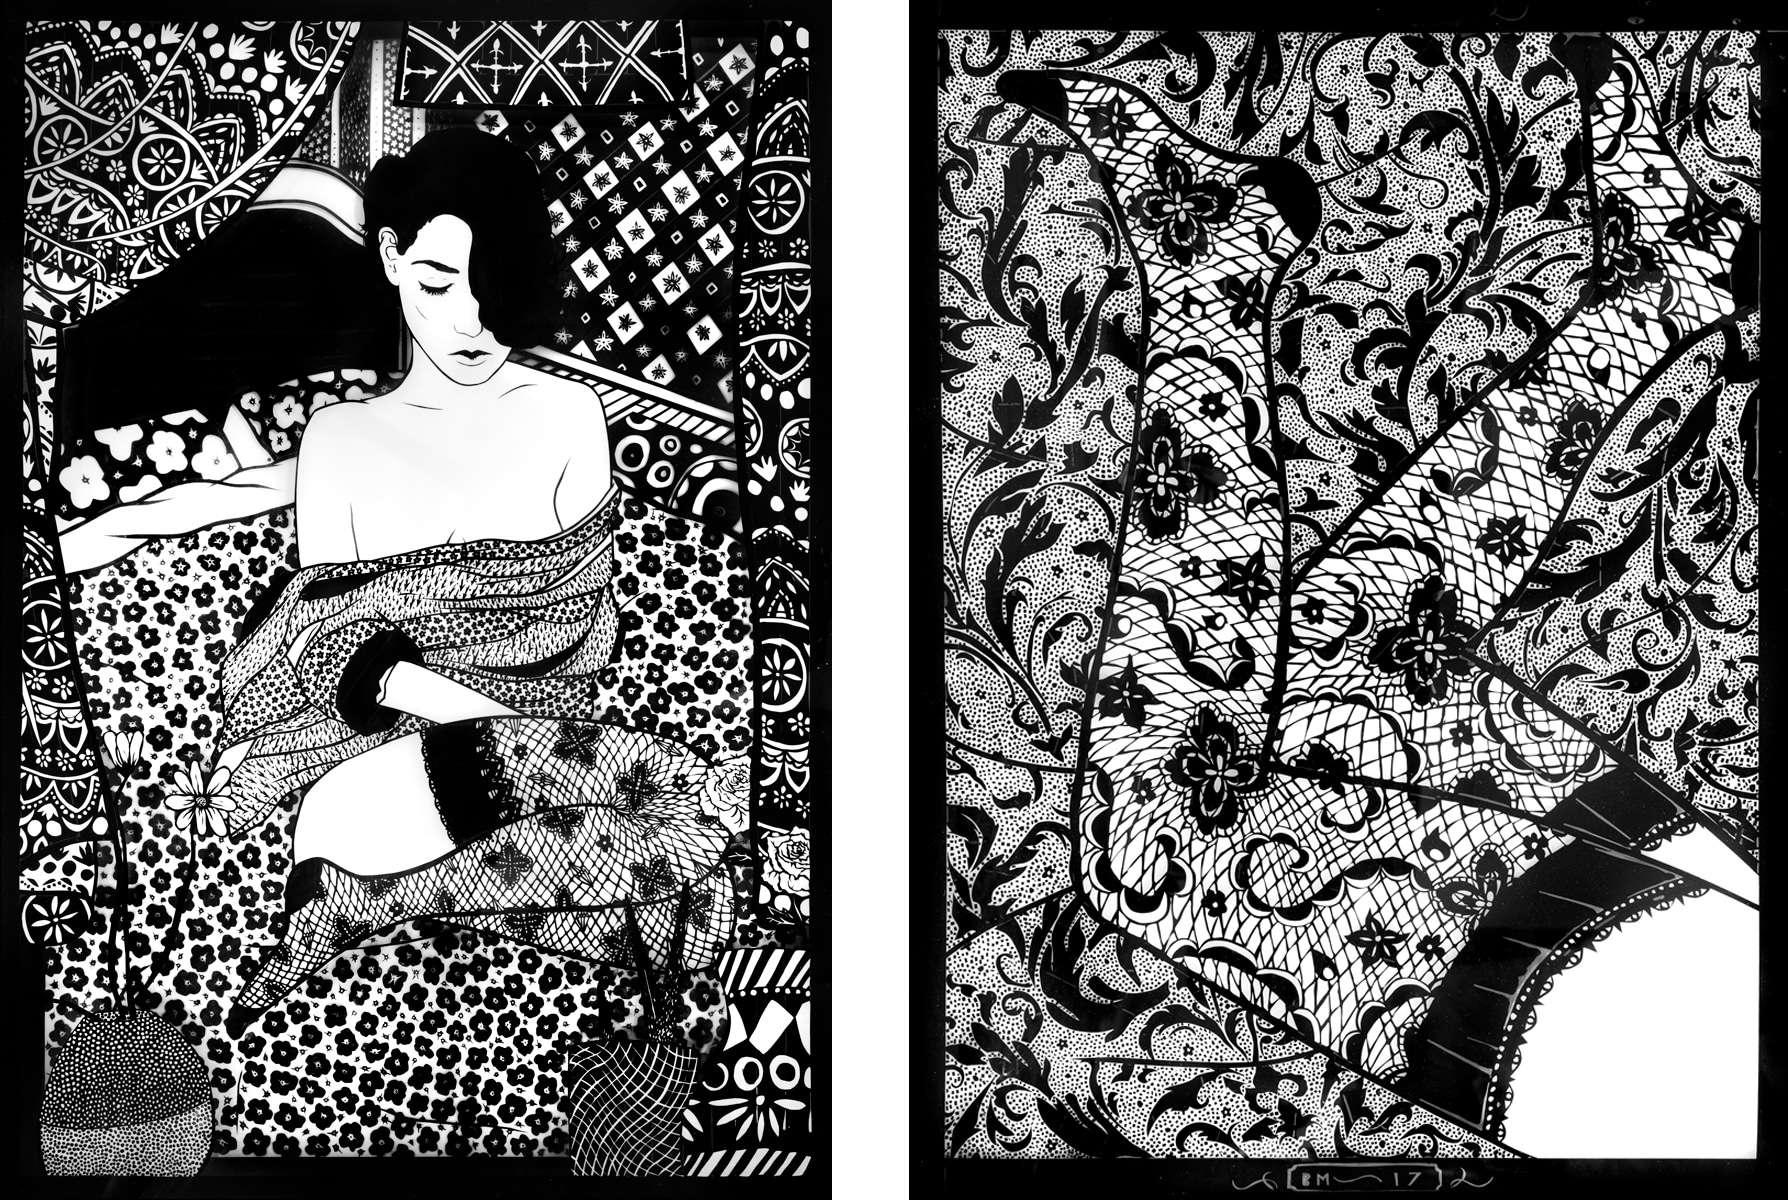 Benjamin Murphy tape art pieces from the Delphian Gallery exhibition Lavish Entropy